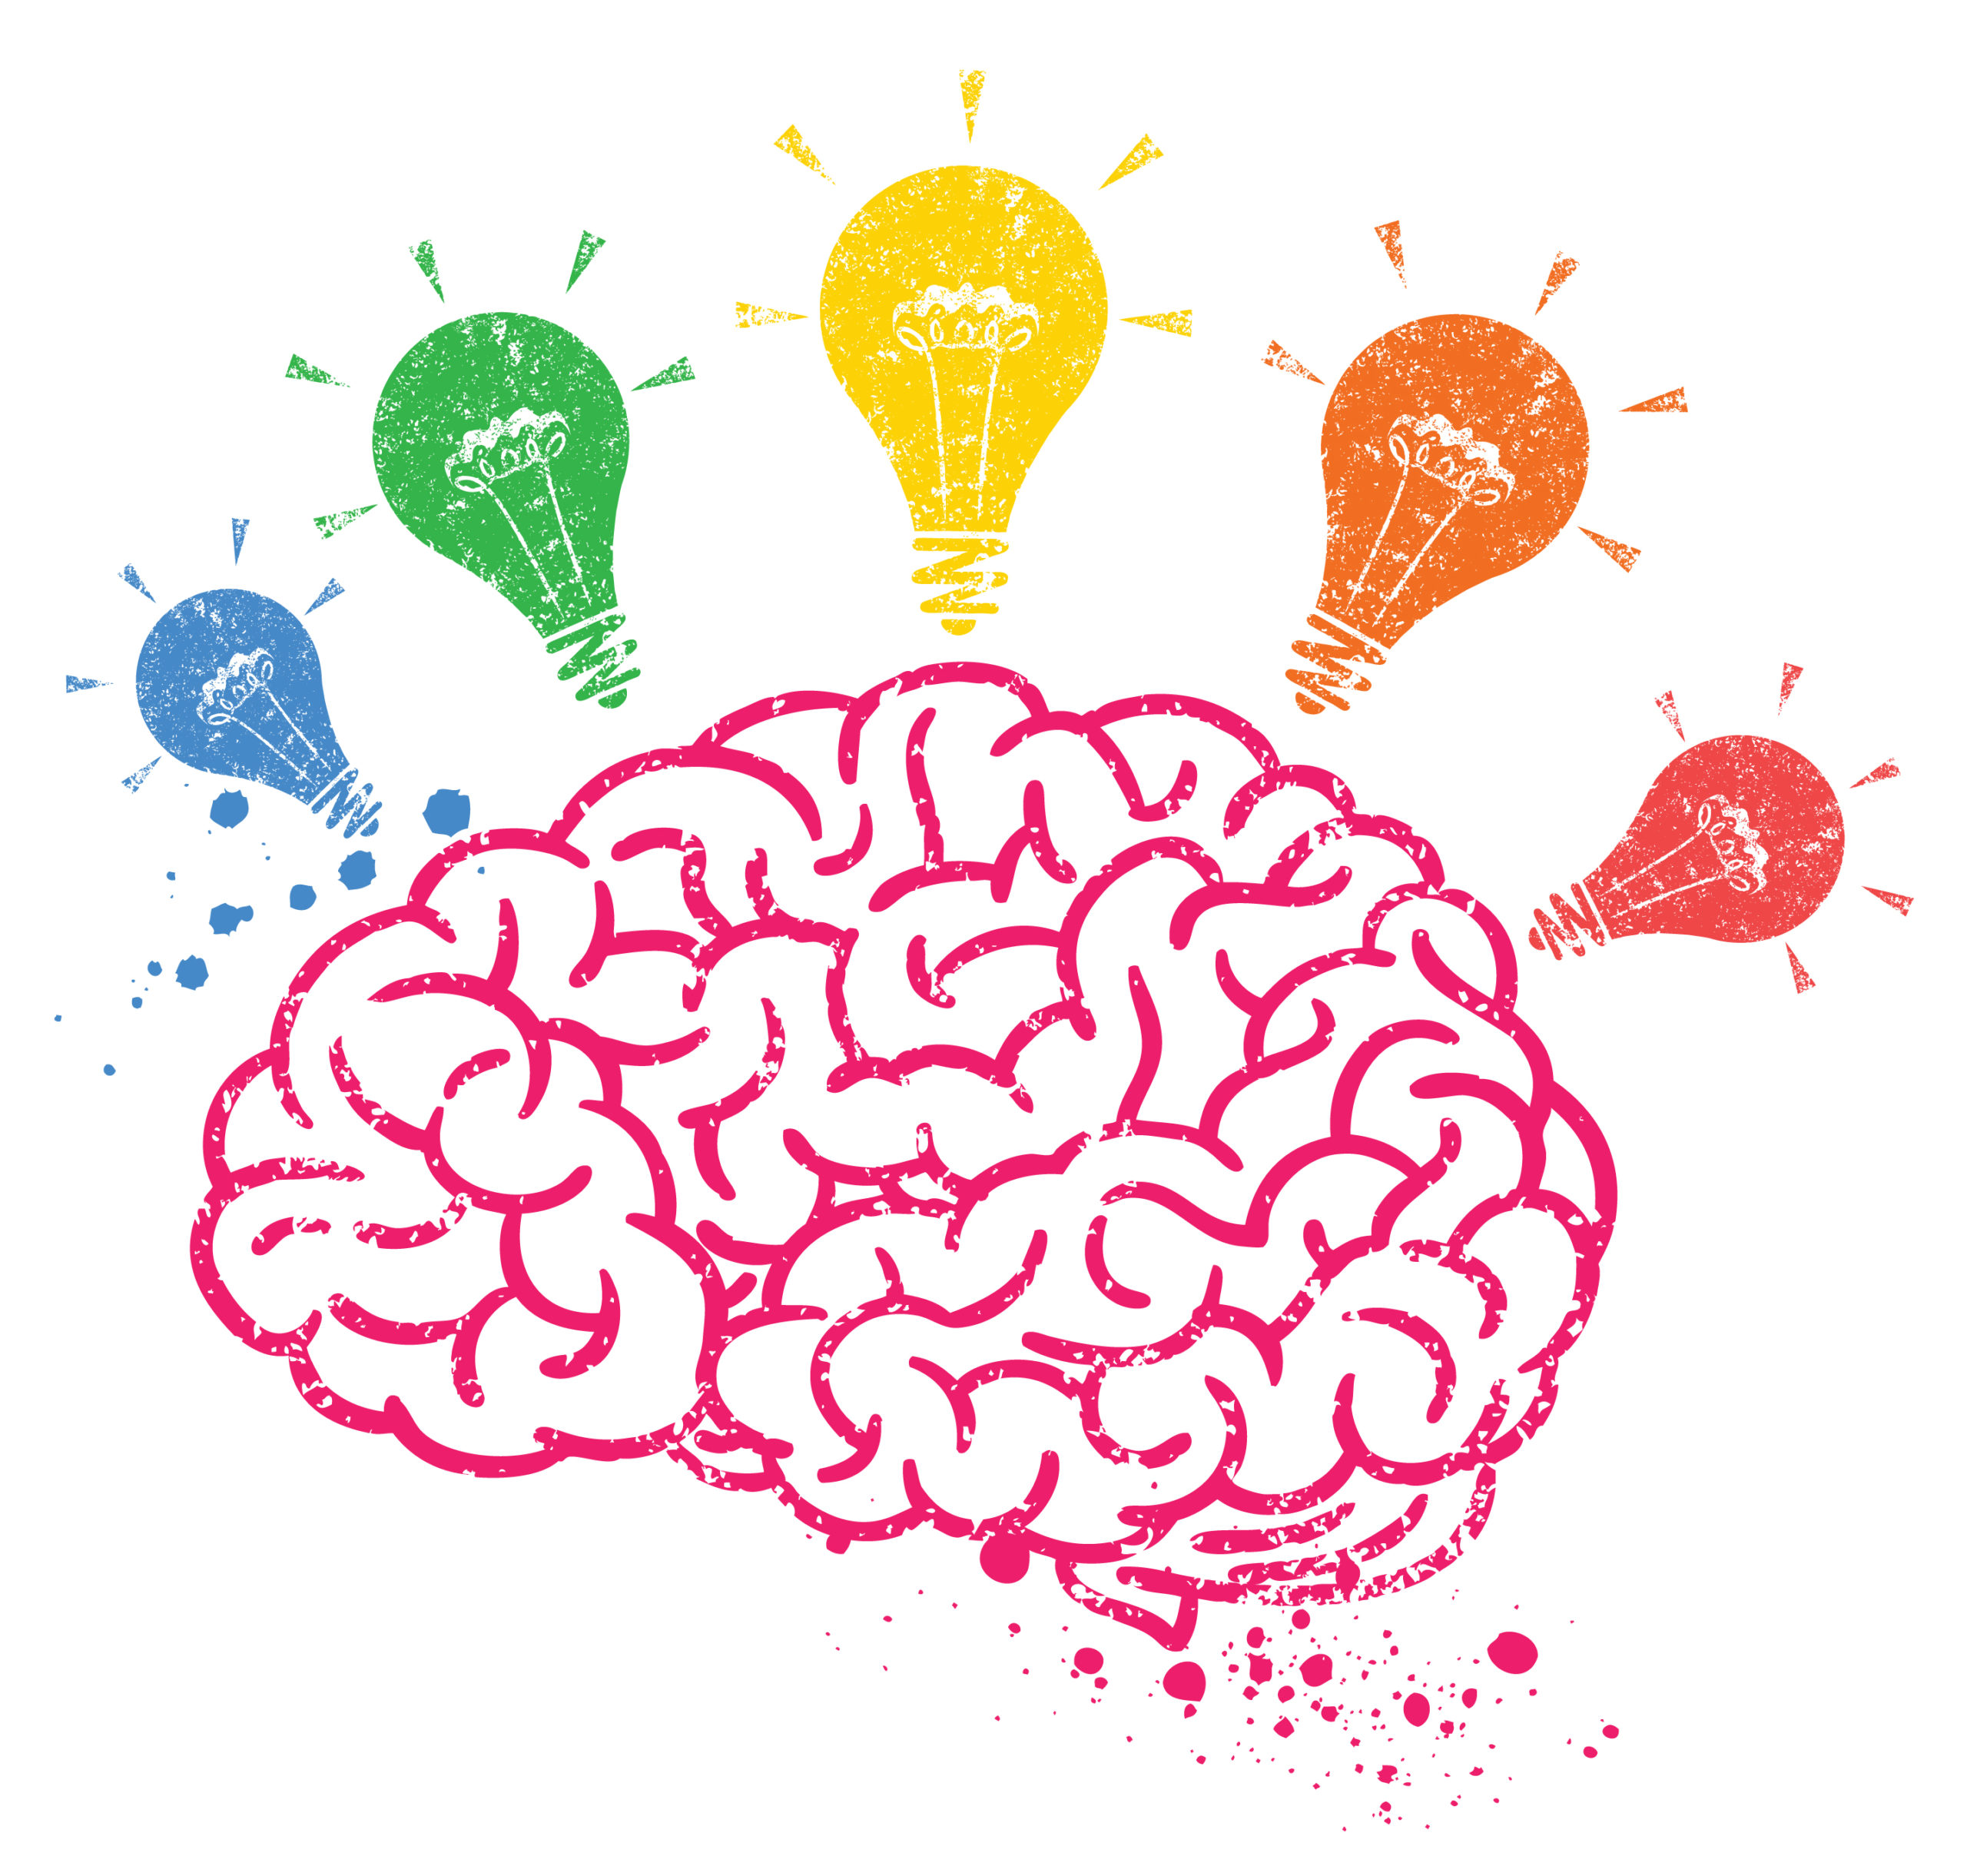 Painter brain and flashbulbs